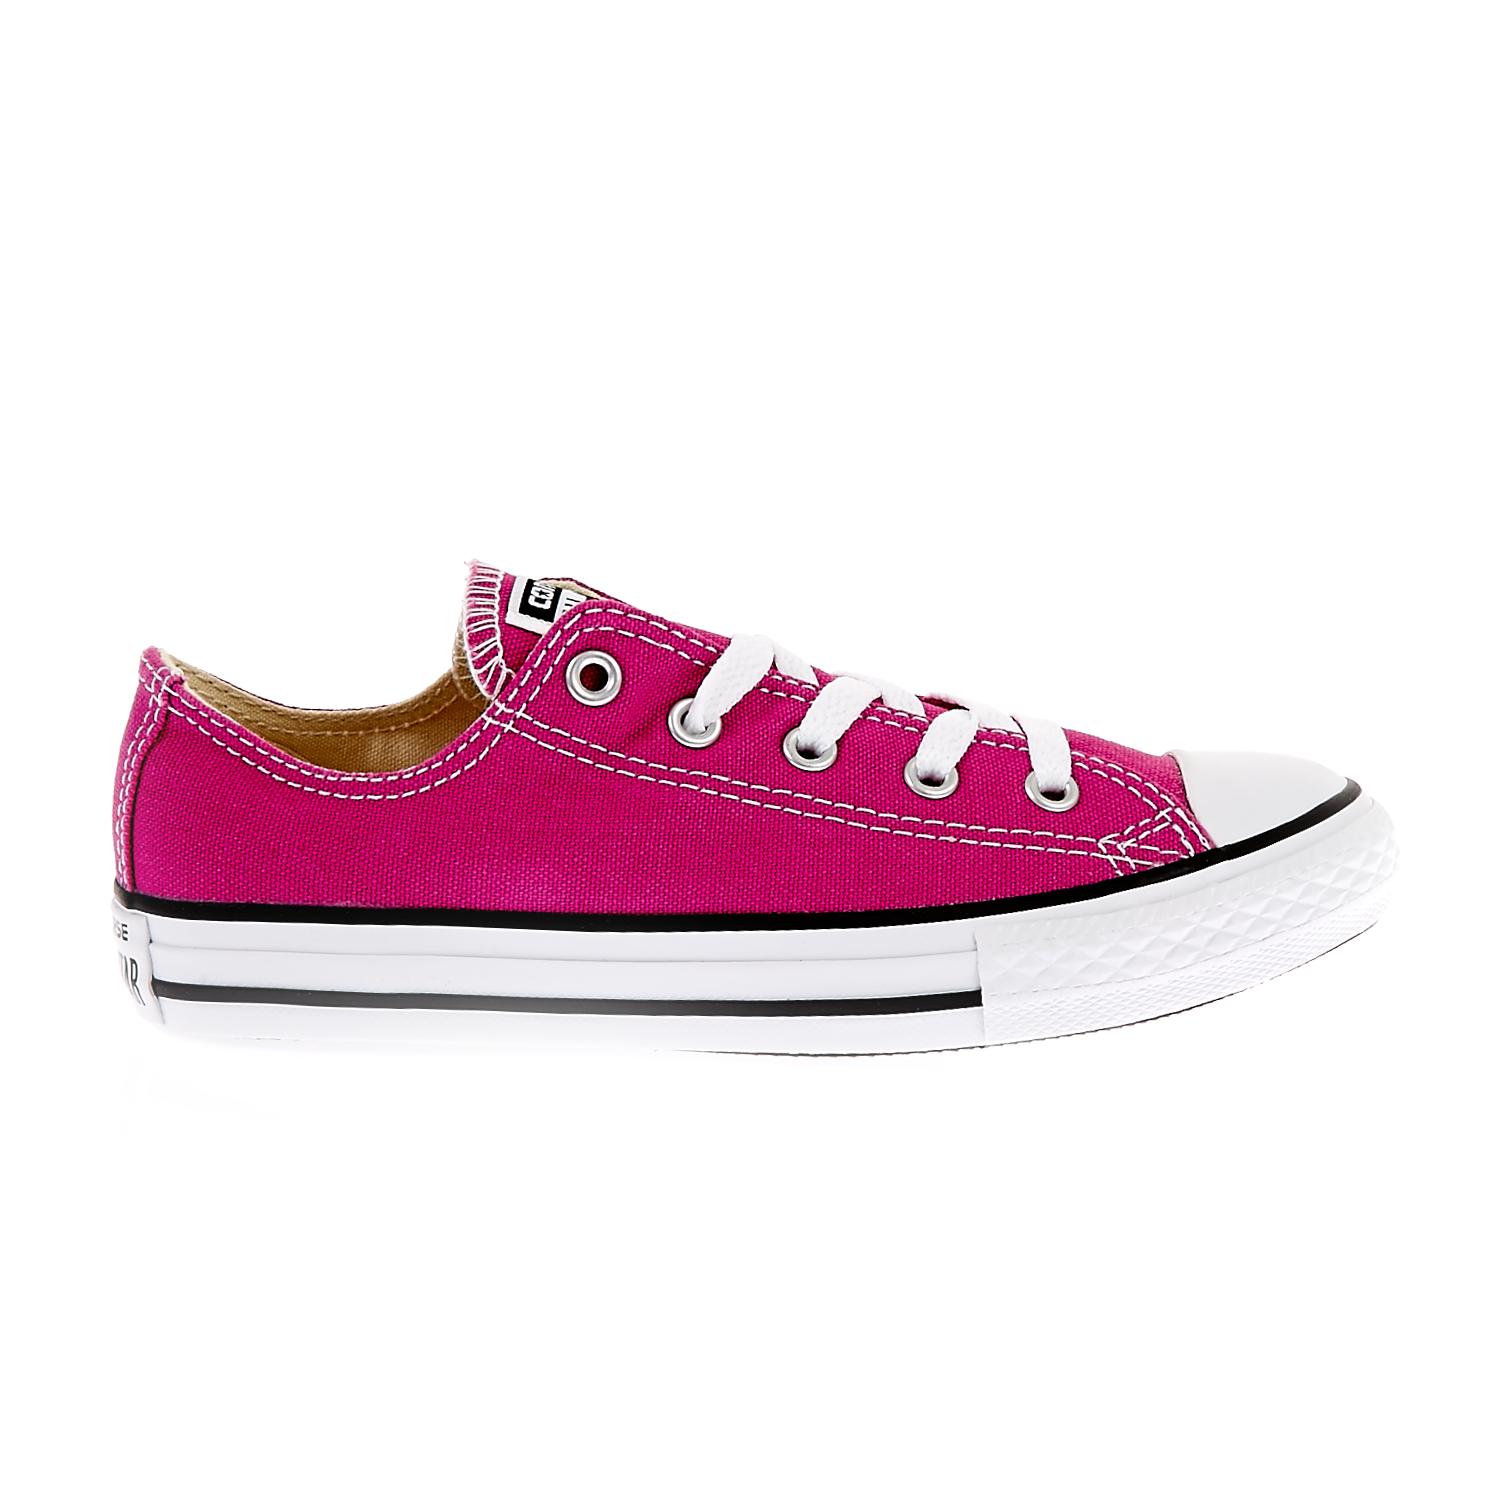 CONVERSE - Παιδικά παπούτσια Chuck Taylor All Star Ox φούξια